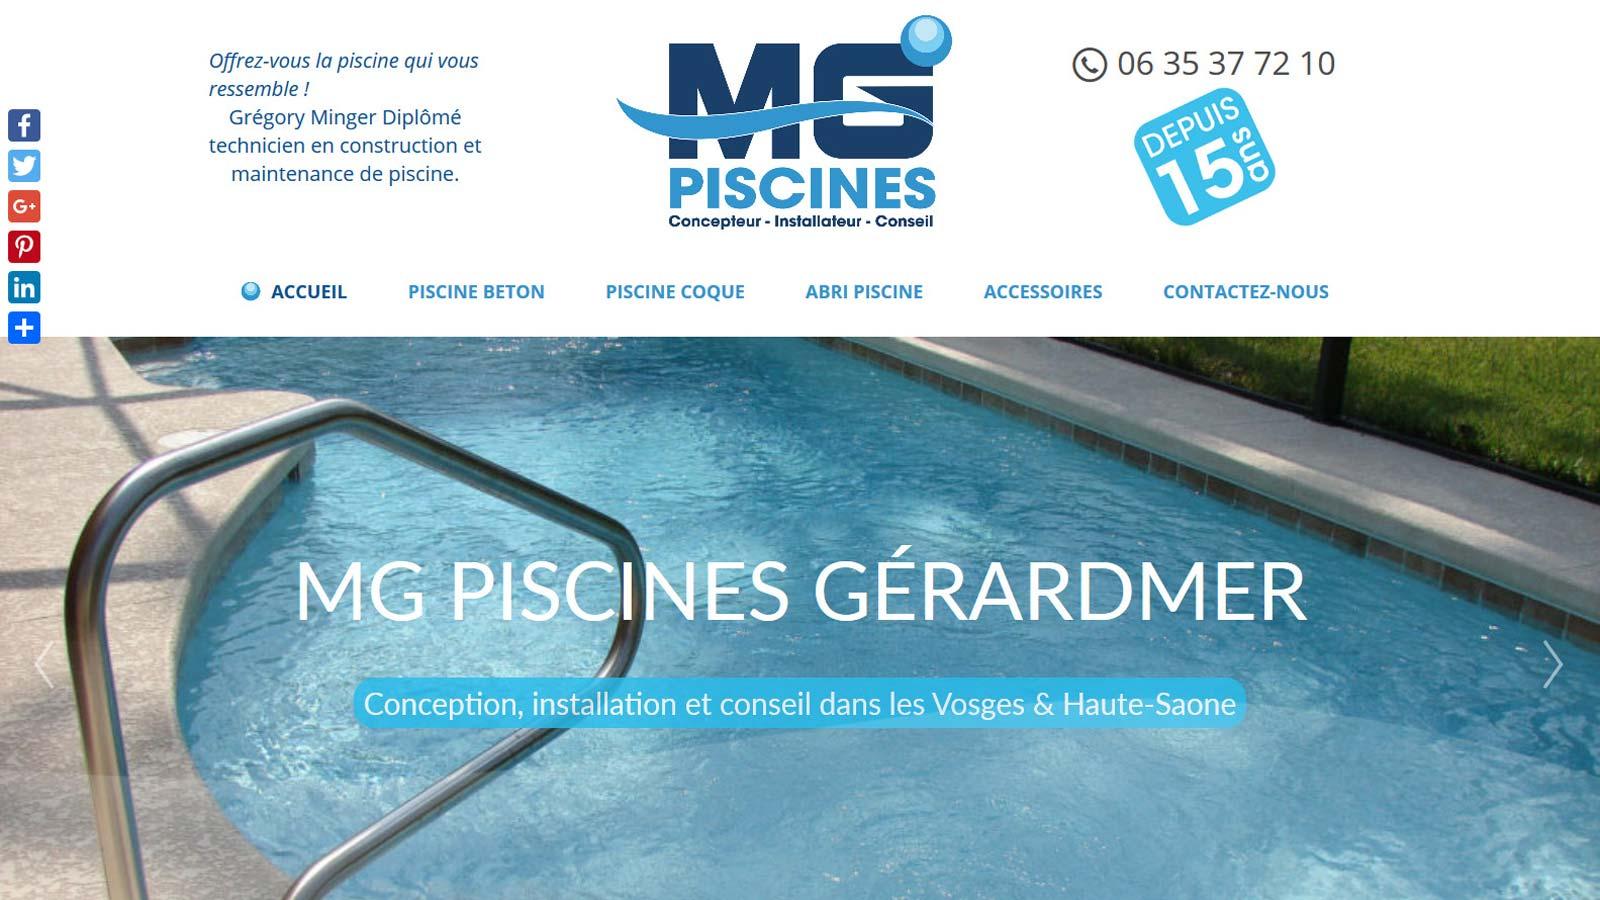 Mg piscines piscinier g rardmer construction en b ton for Piscine gerardmer